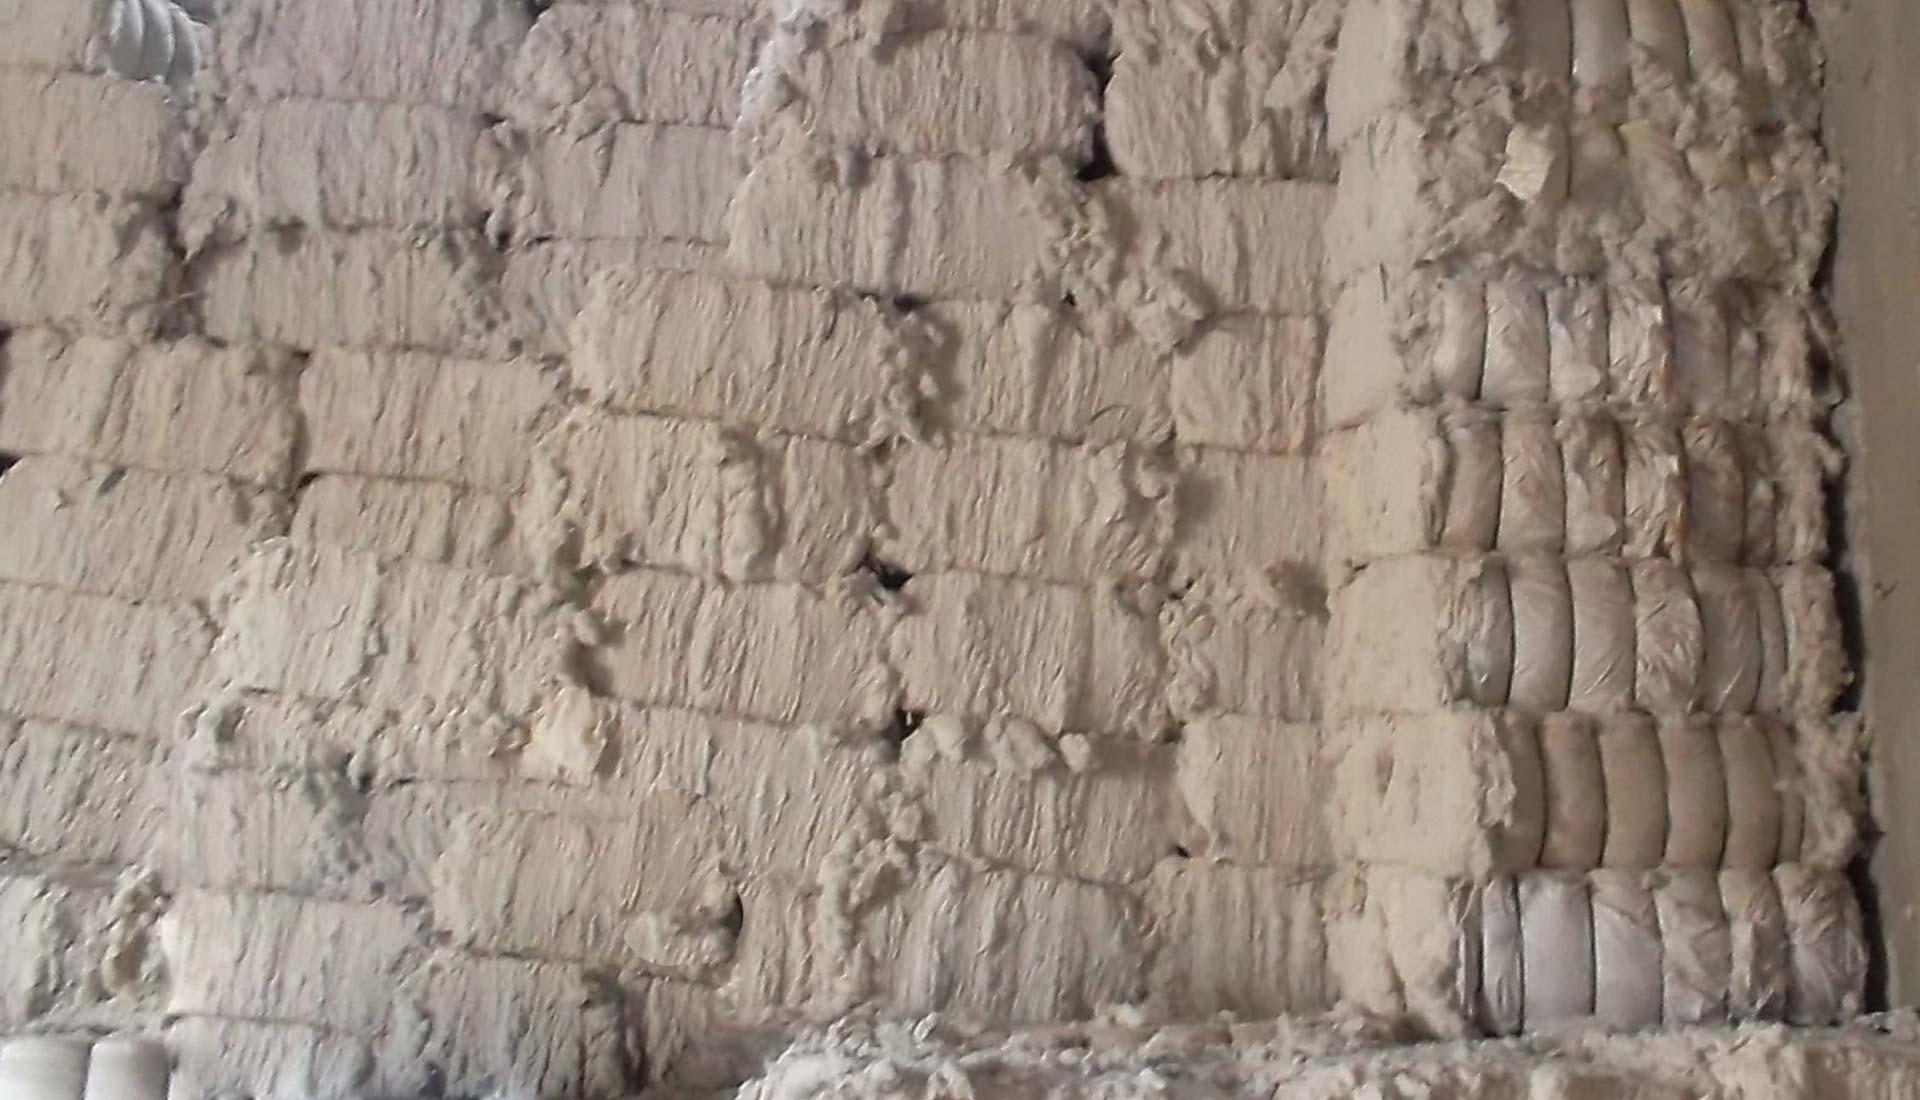 YarnTrade - Spinning Cotton Waste